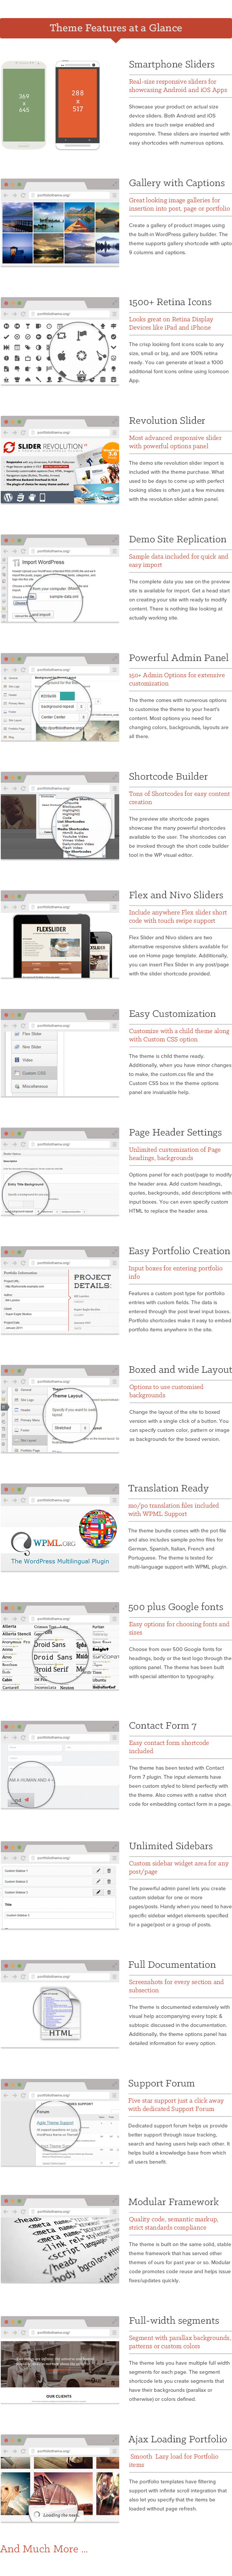 agile dashboard new 2 - Agile - Multi-Purpose App Showcase WordPress Theme